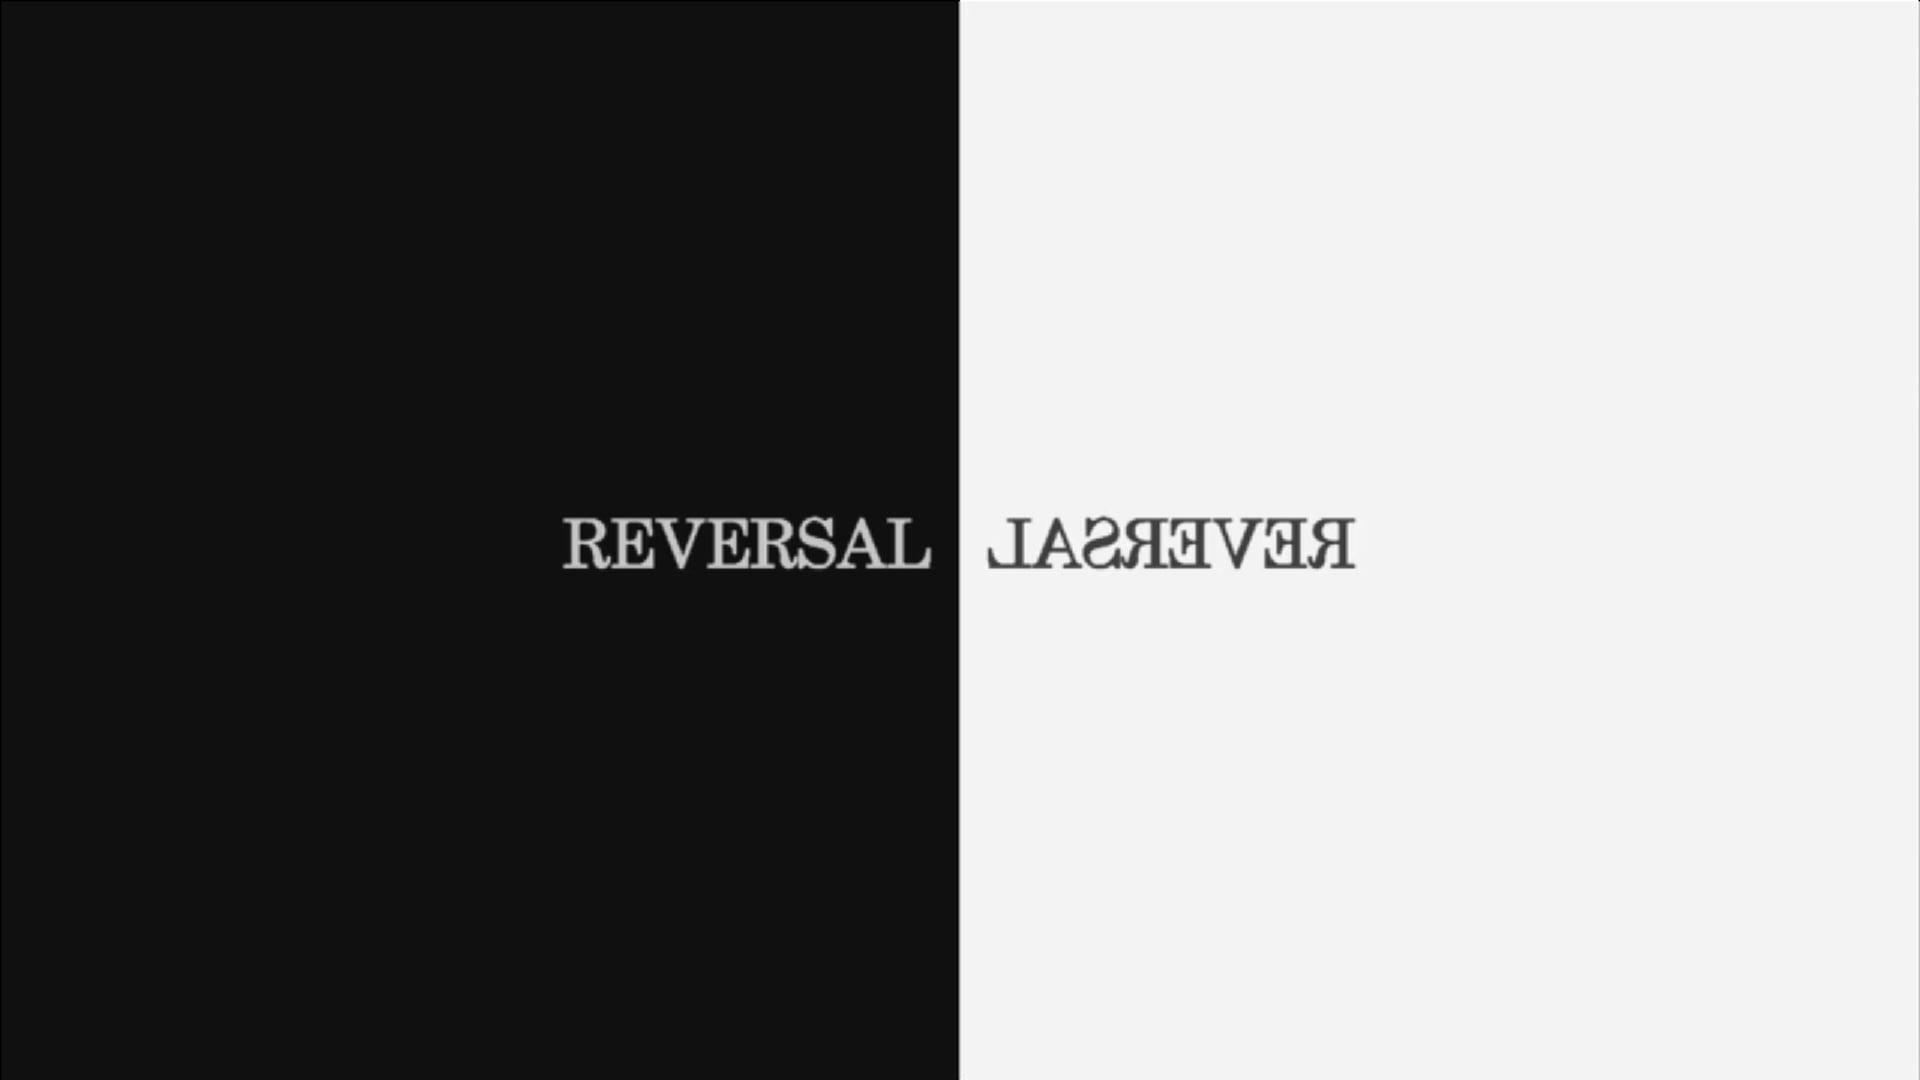 UNI//CPDR Task 001 - Reversal